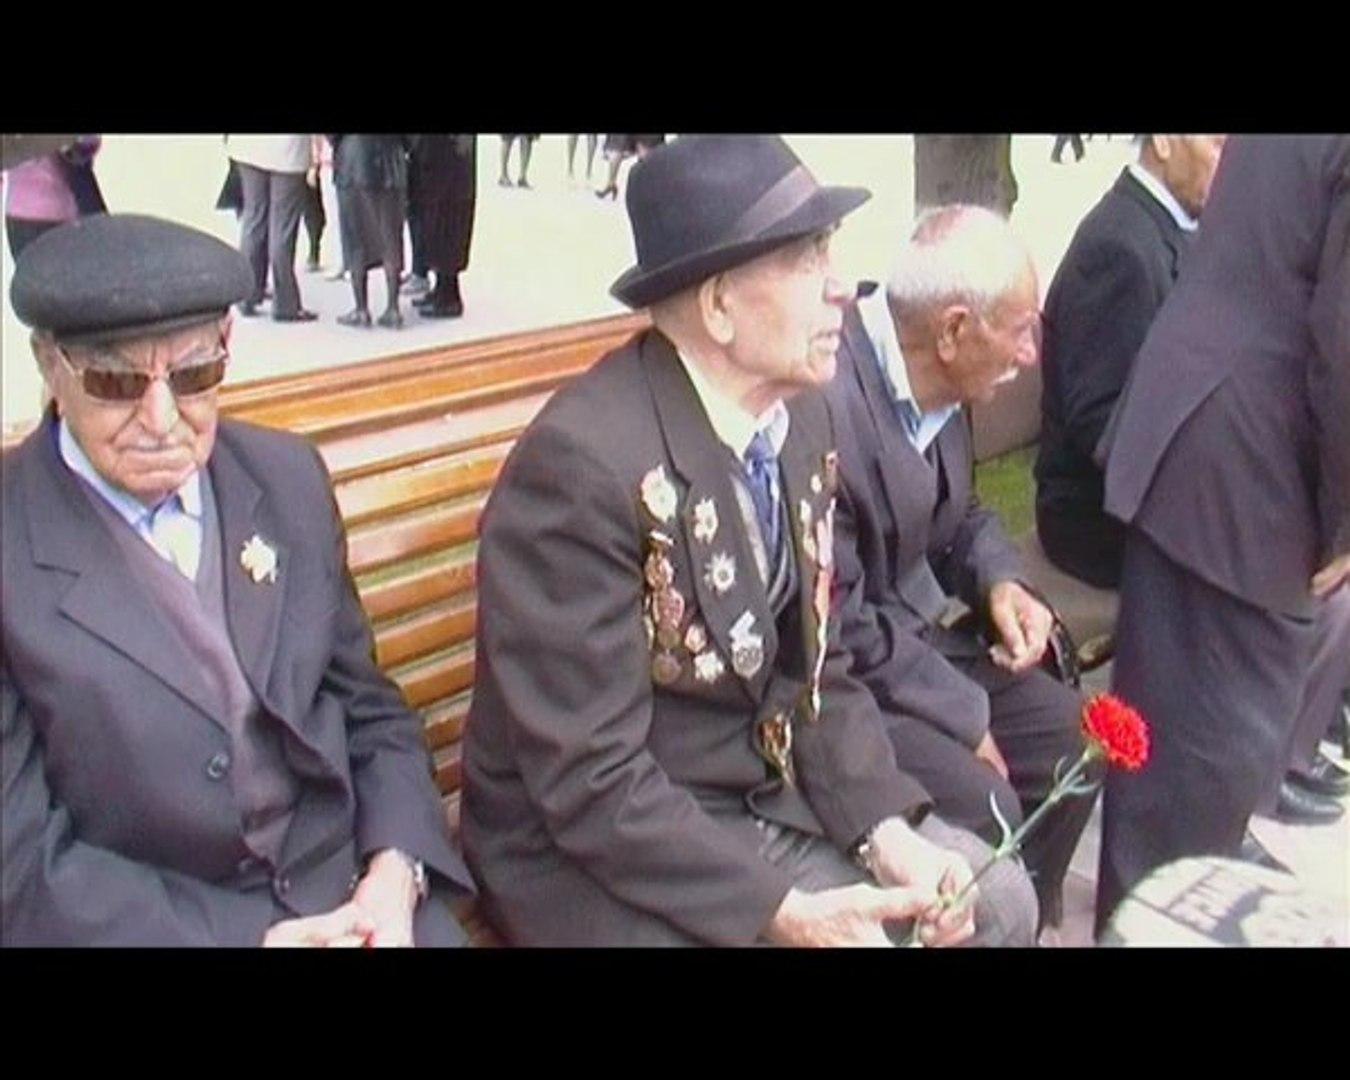 День Победы 2011 г. - 9 май Азербайджан г. Сумгаит